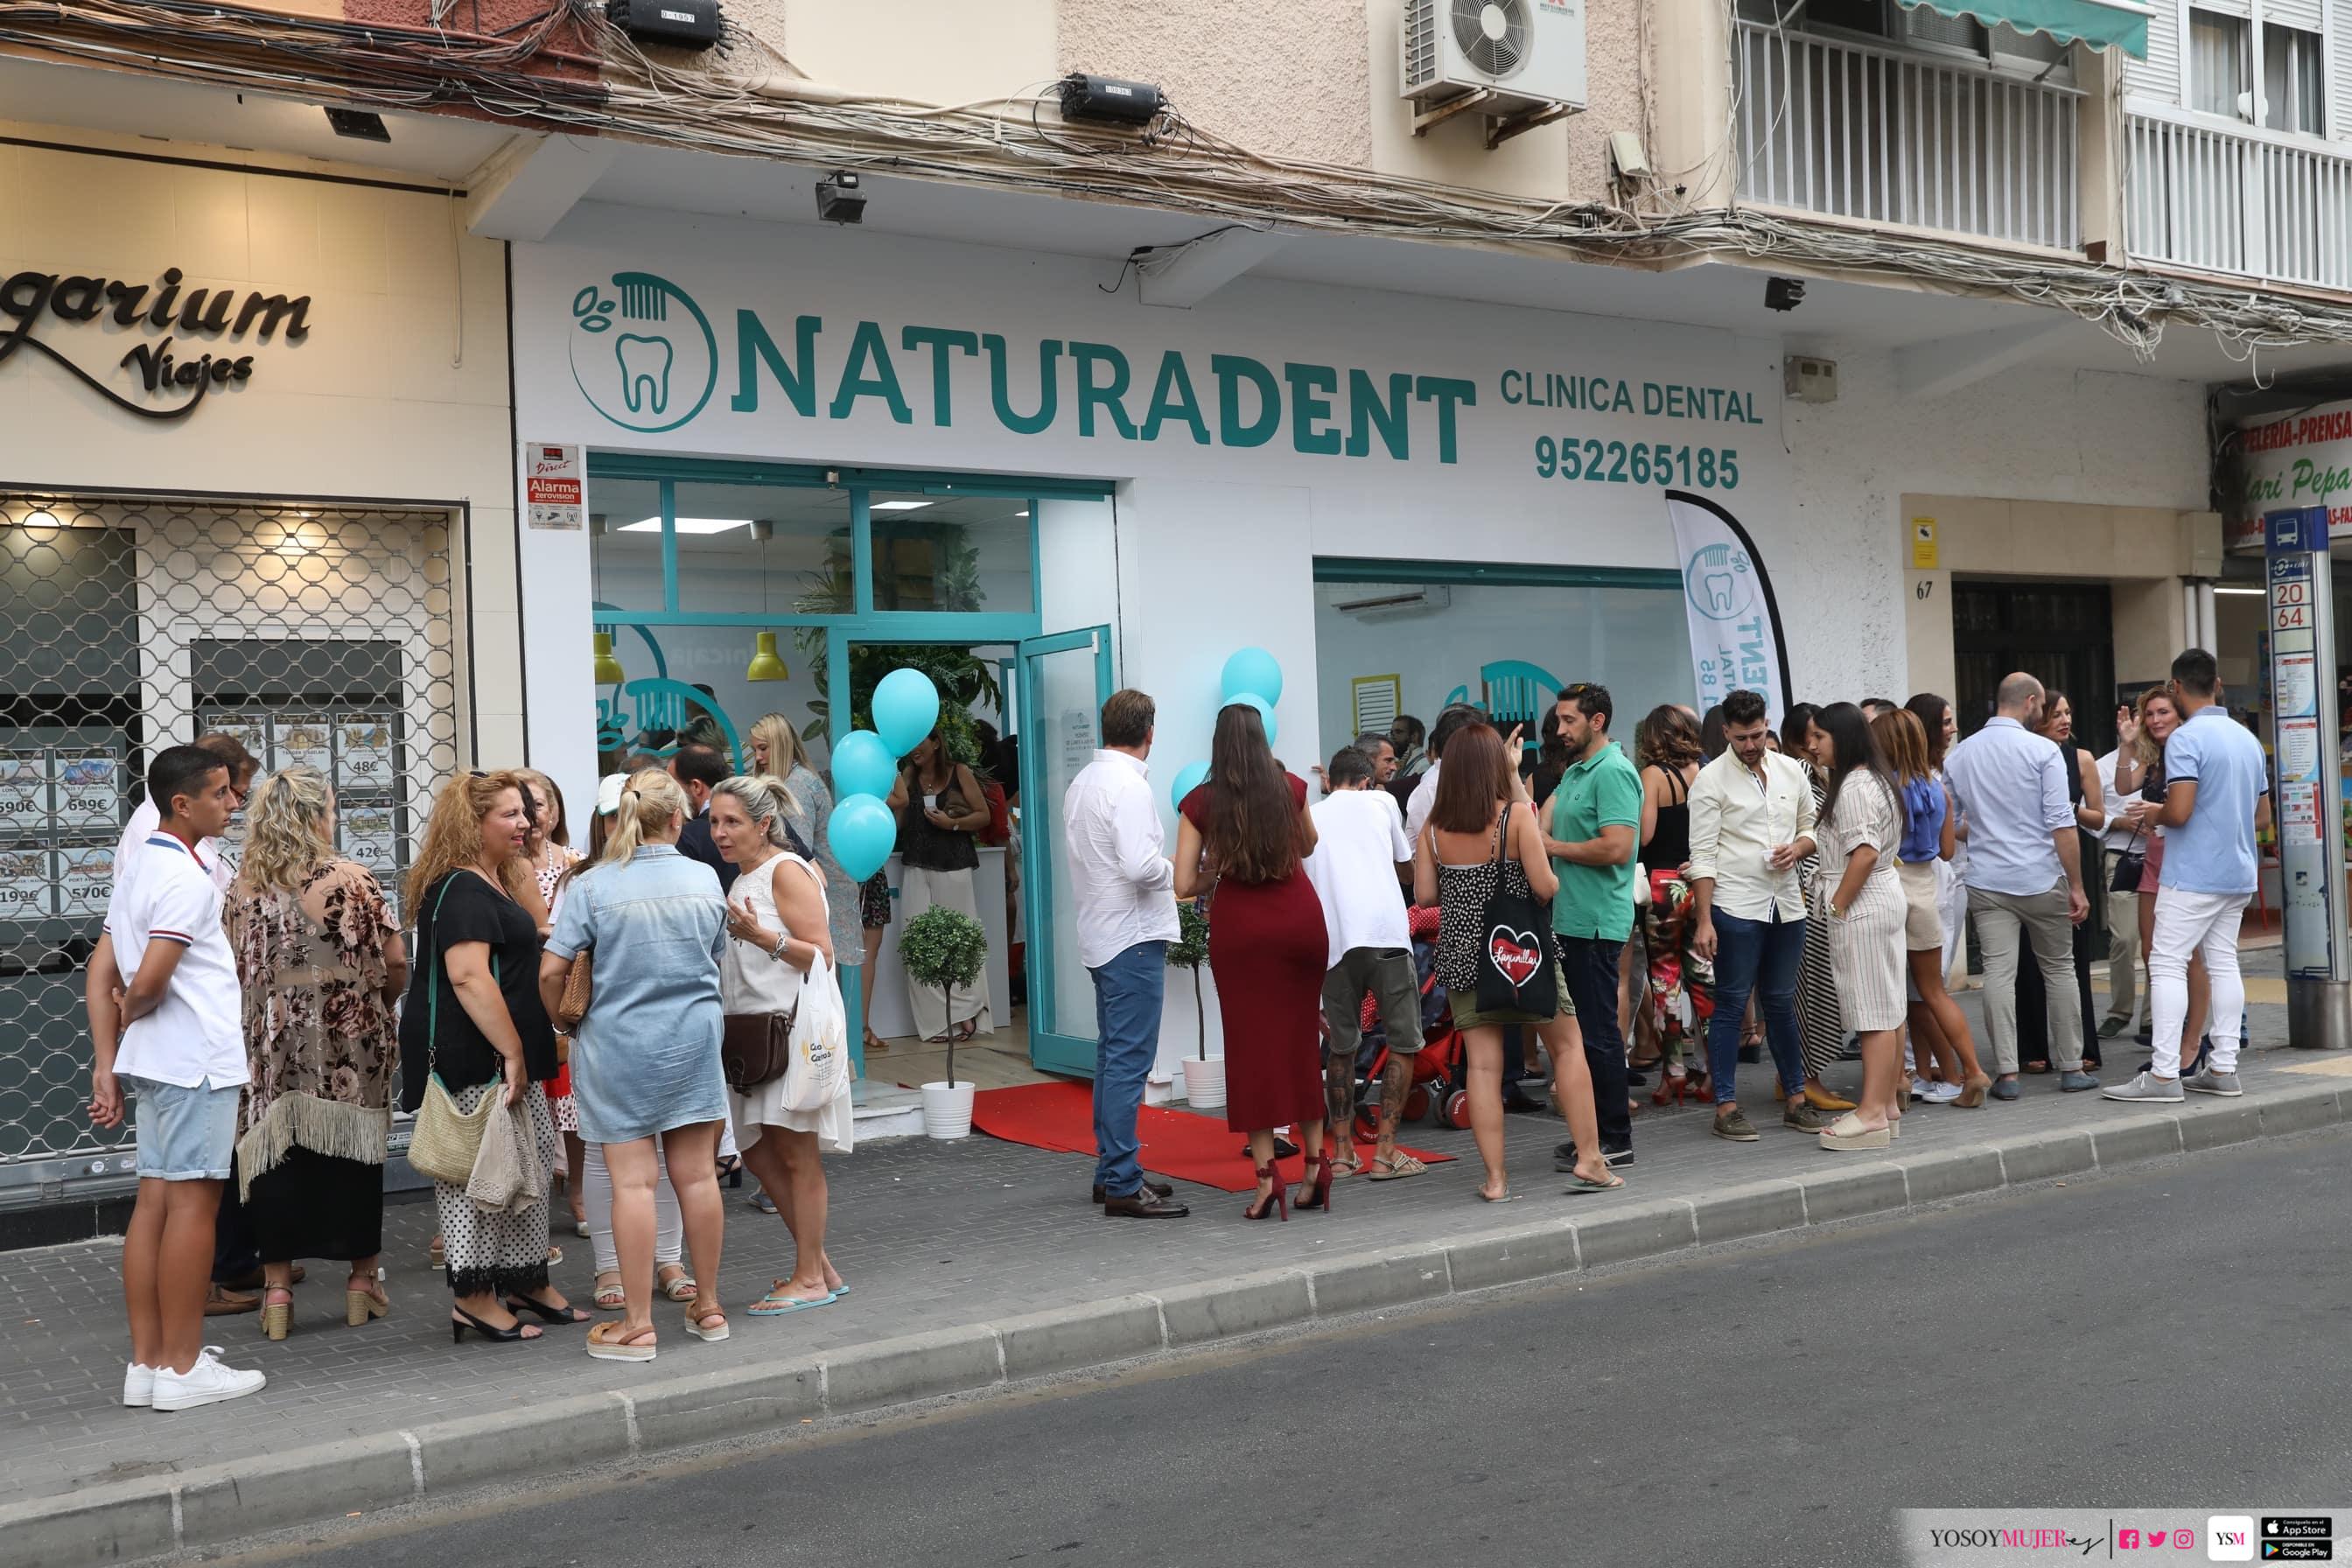 Naturadent